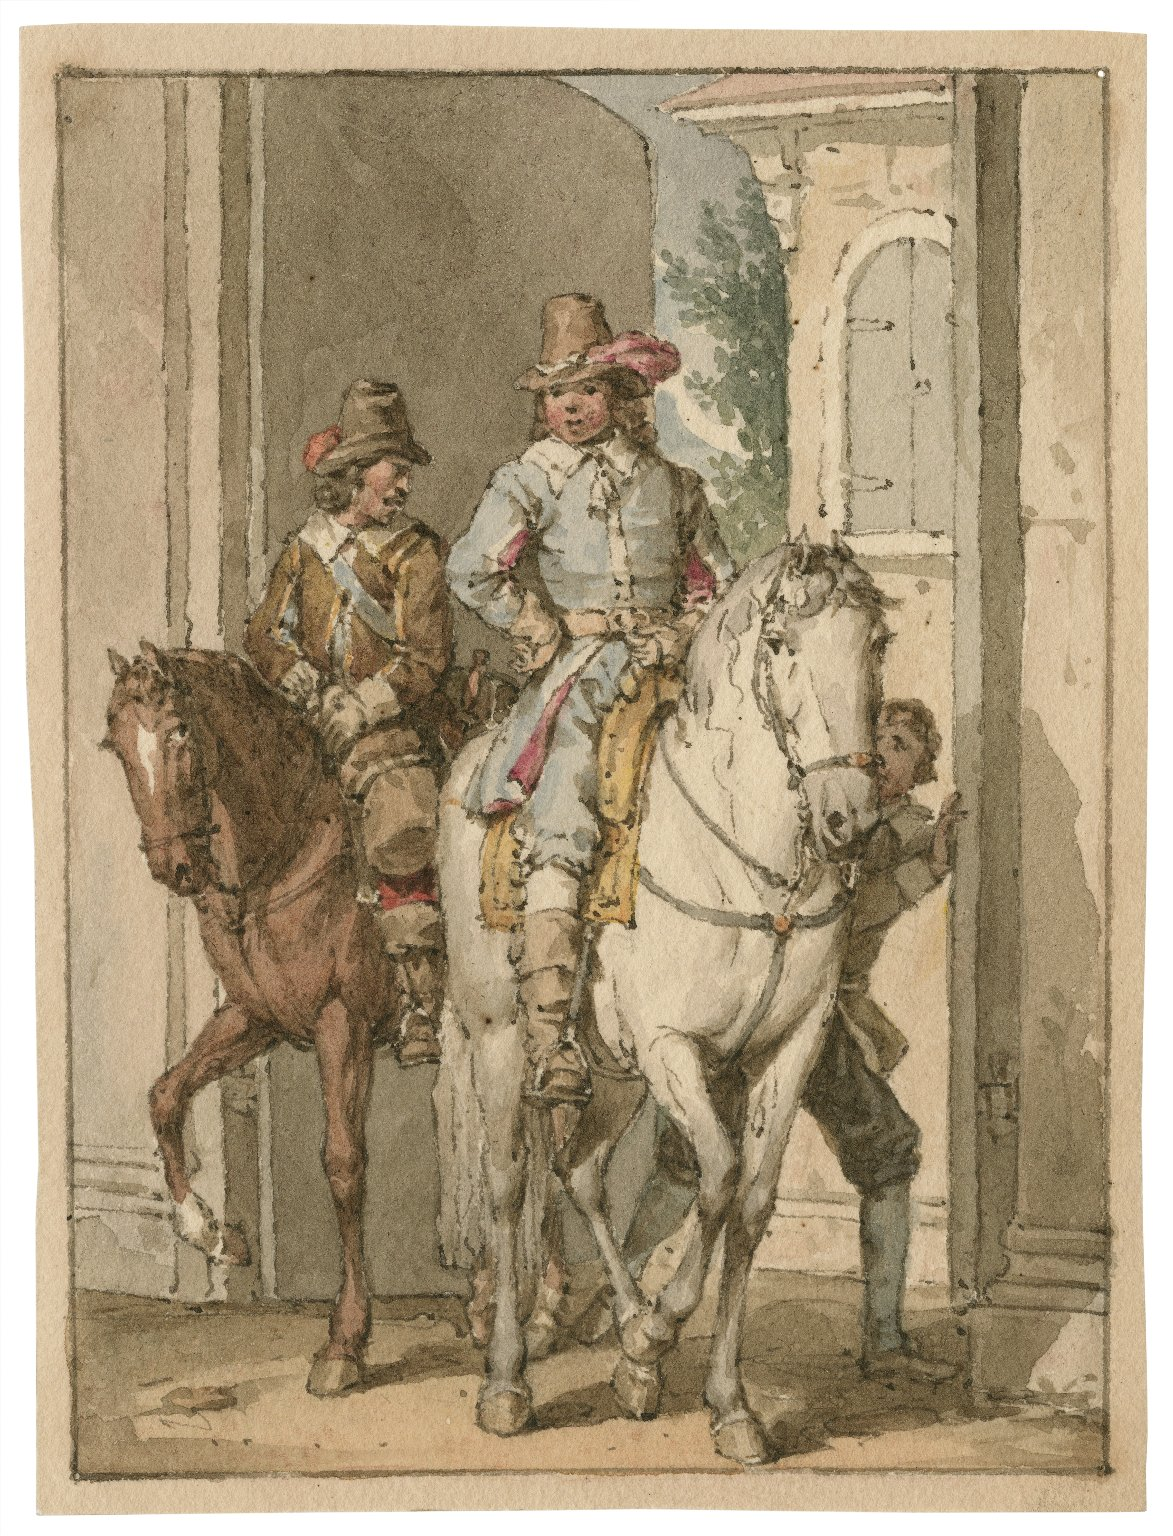 [Two gentlemen of Verona] [graphic] / [John Augustus Atkinson].